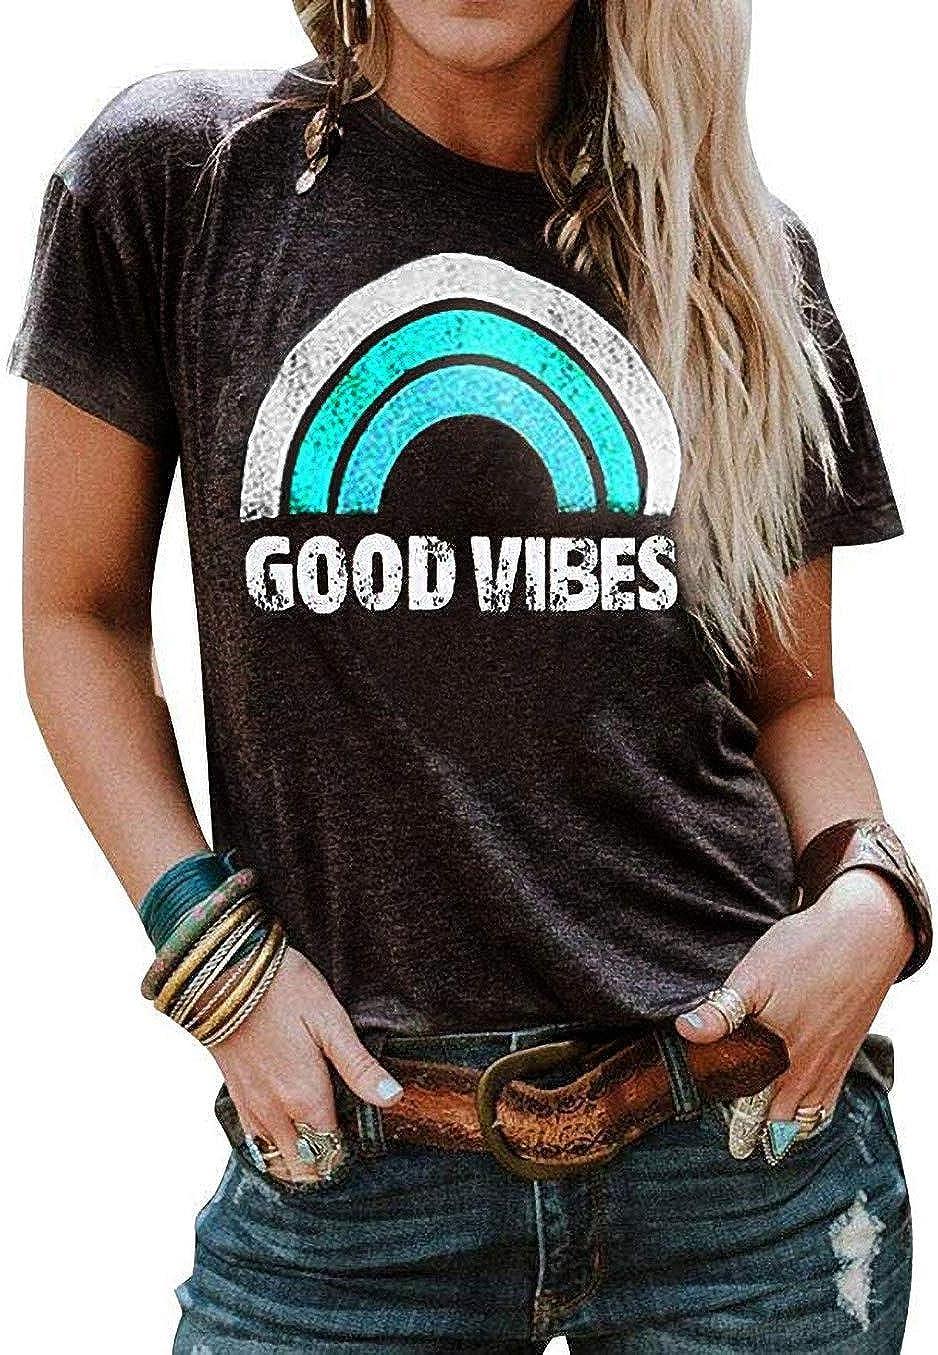 Vaise Womens Graphic Good Vibes Tank Tops Casual Summer Tank Tops Short Sleeve Shirts Tunics Rainbow Good Vibes Shirt